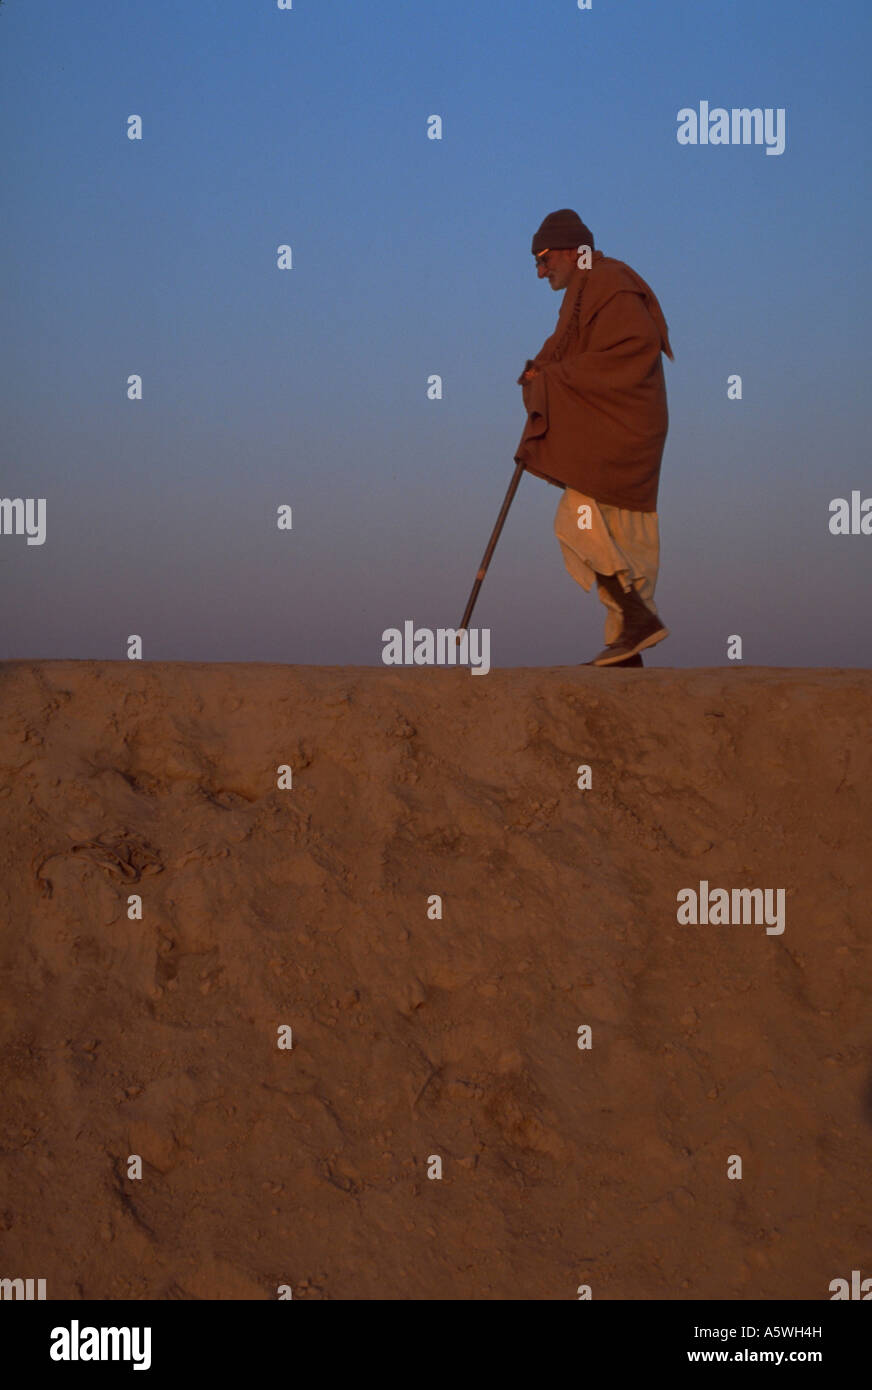 Painet hl0311 hindu man male atop sandy ridge 2001 kumbhmela festival allahabad india peasant woman female cane - Stock Image